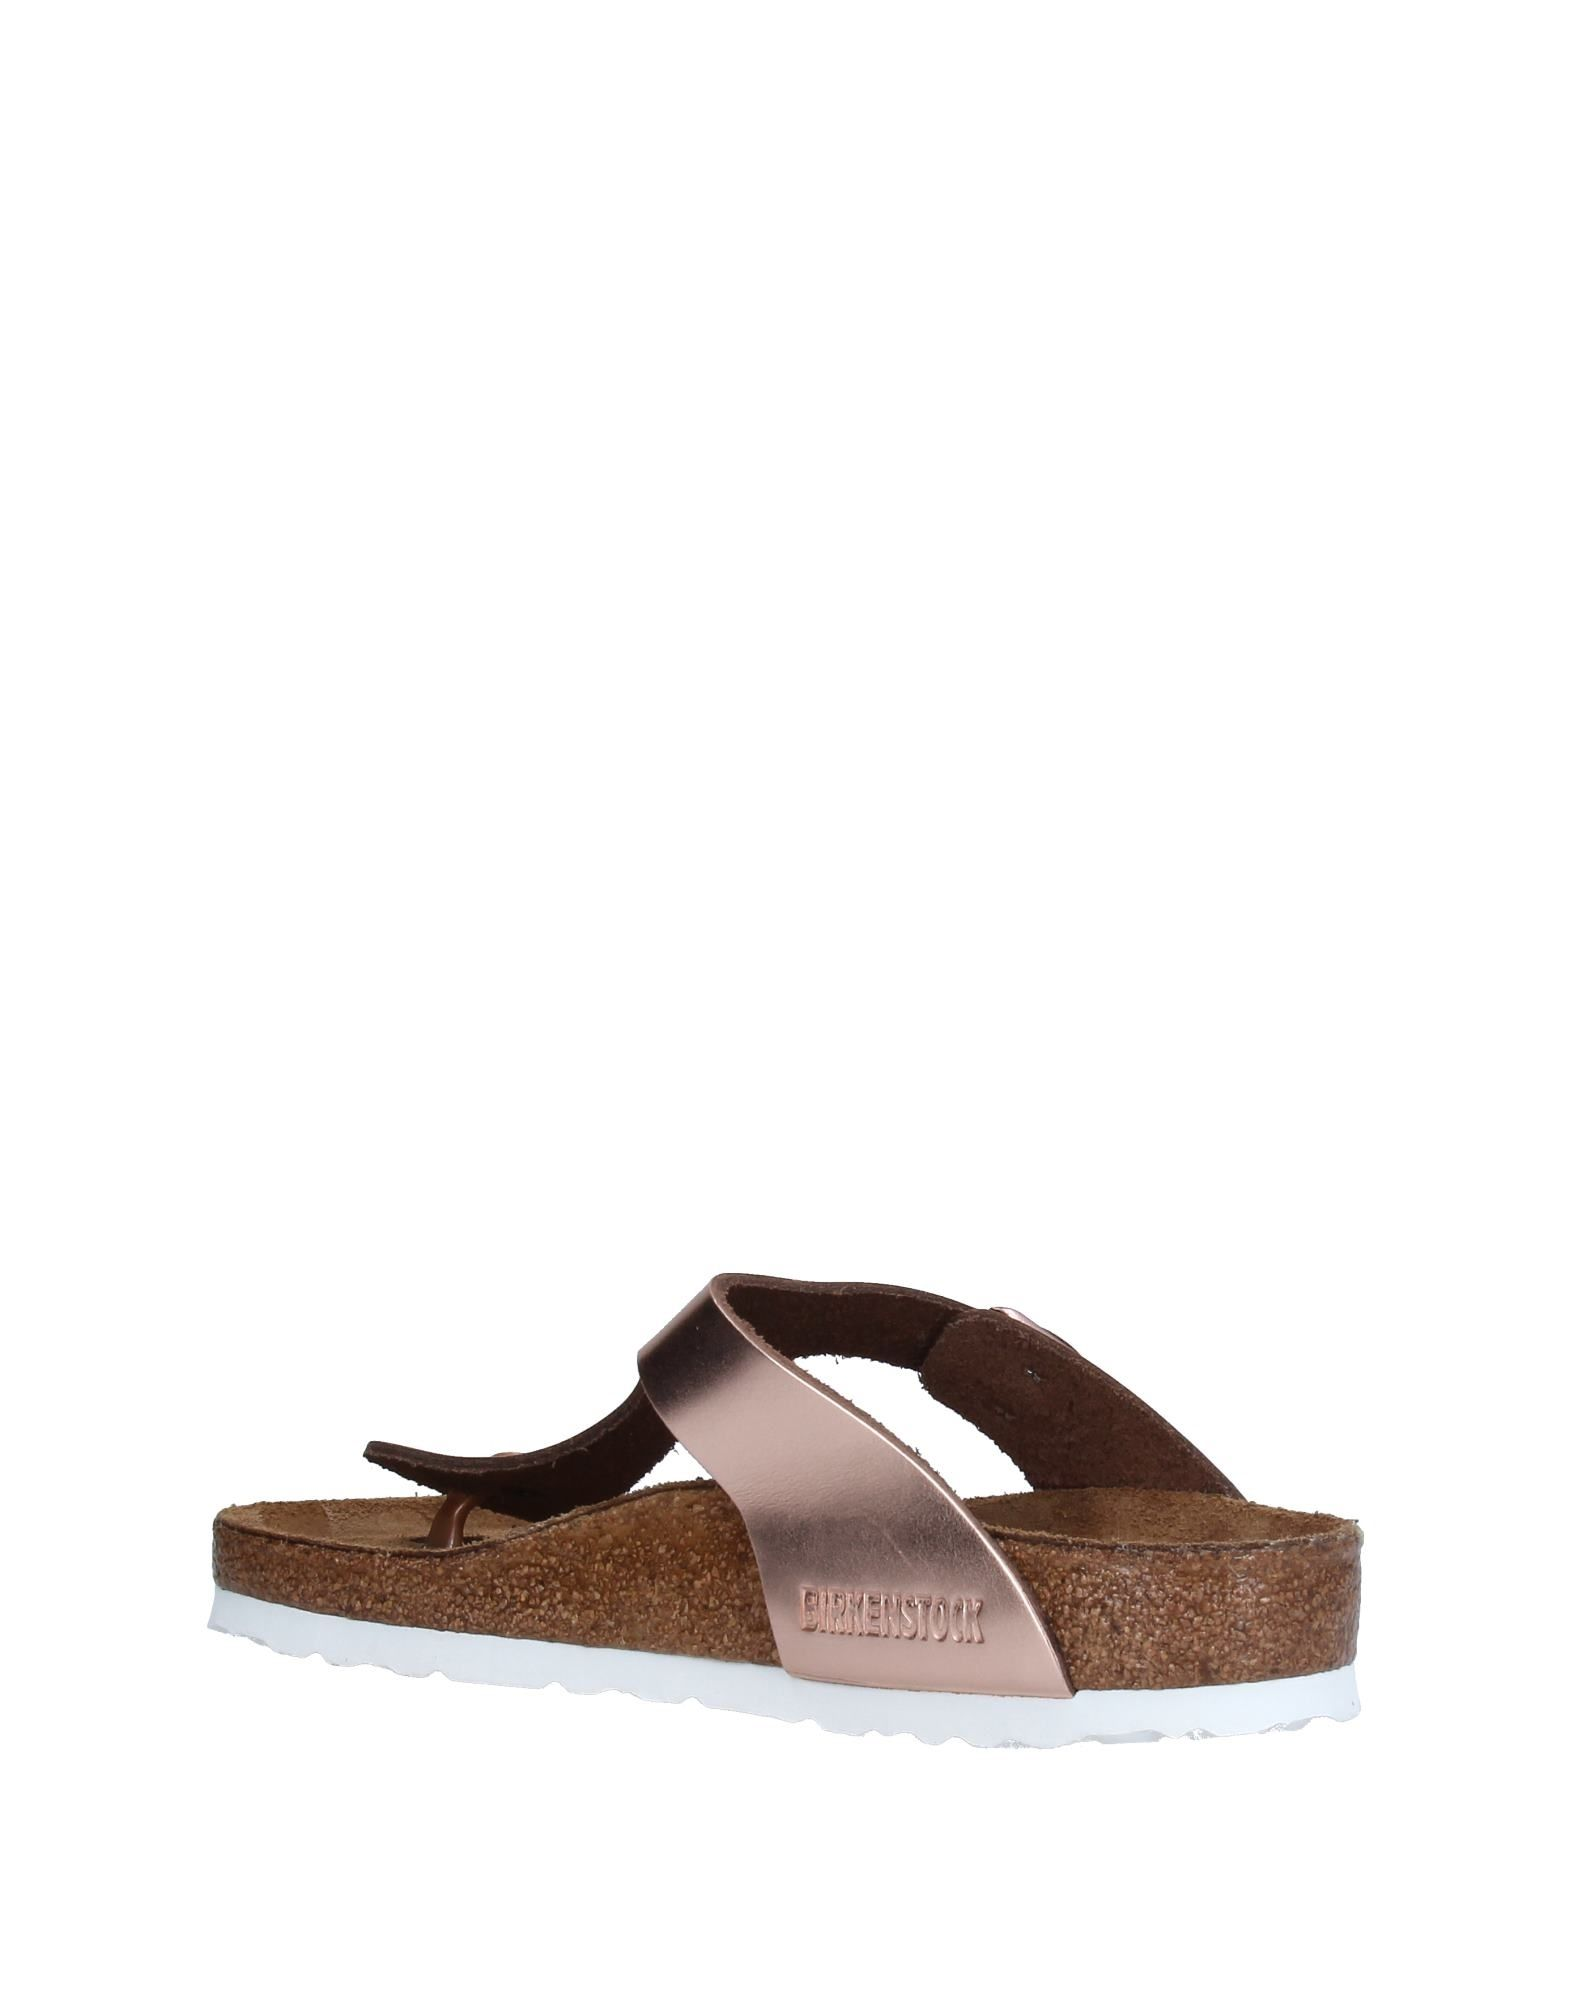 Birkenstock Gute Dianetten Damen  11217885IT Gute Birkenstock Qualität beliebte Schuhe a8c6ac